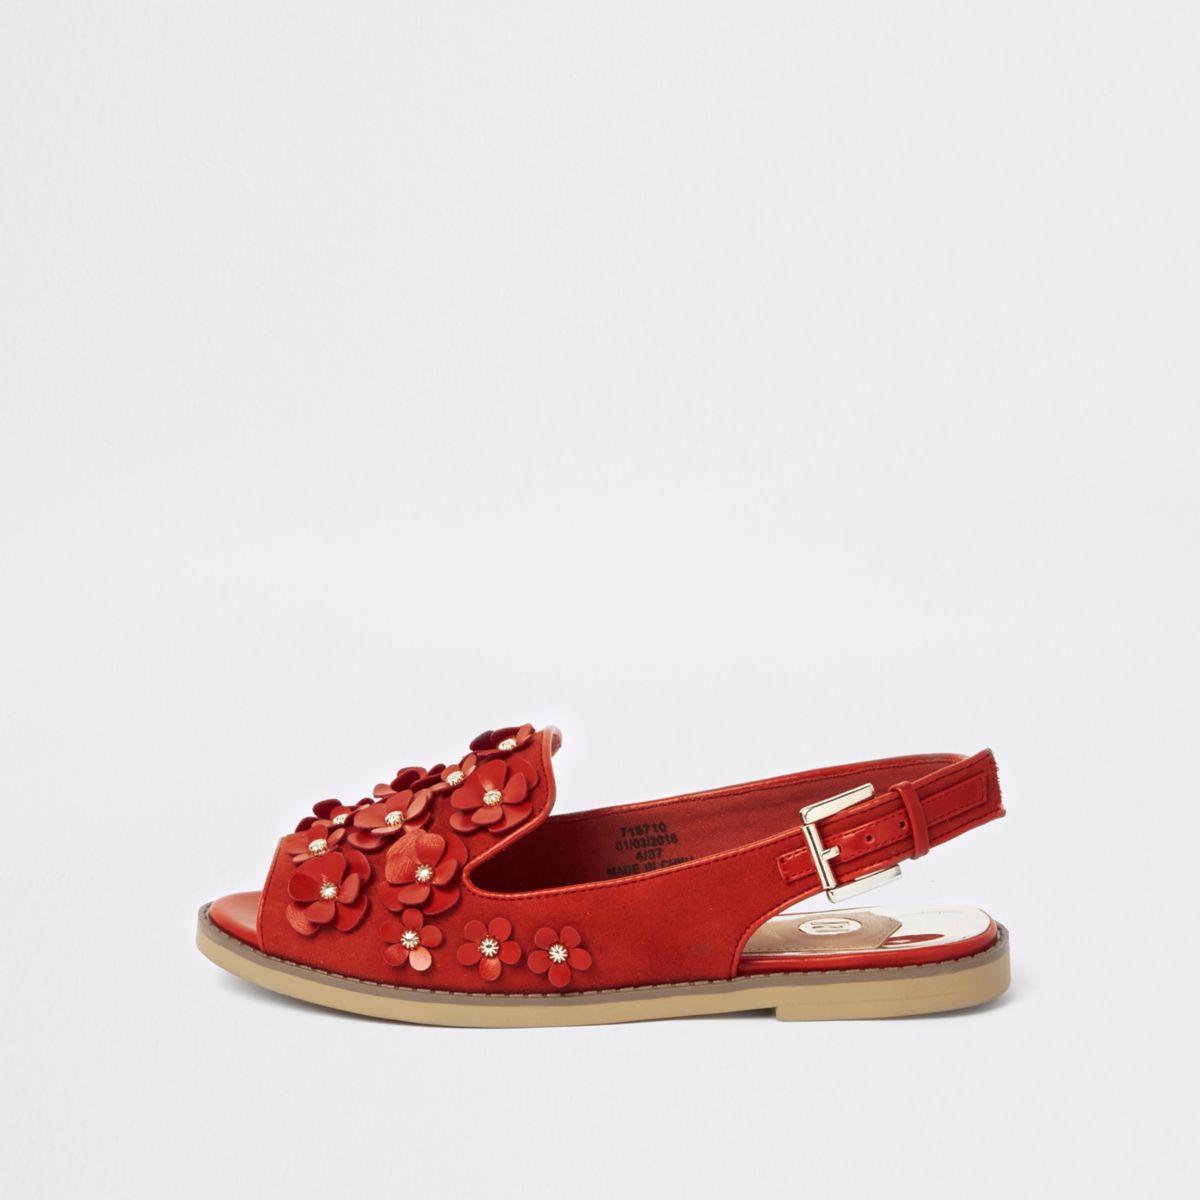 Red 3D flower slingback peep toe loafers